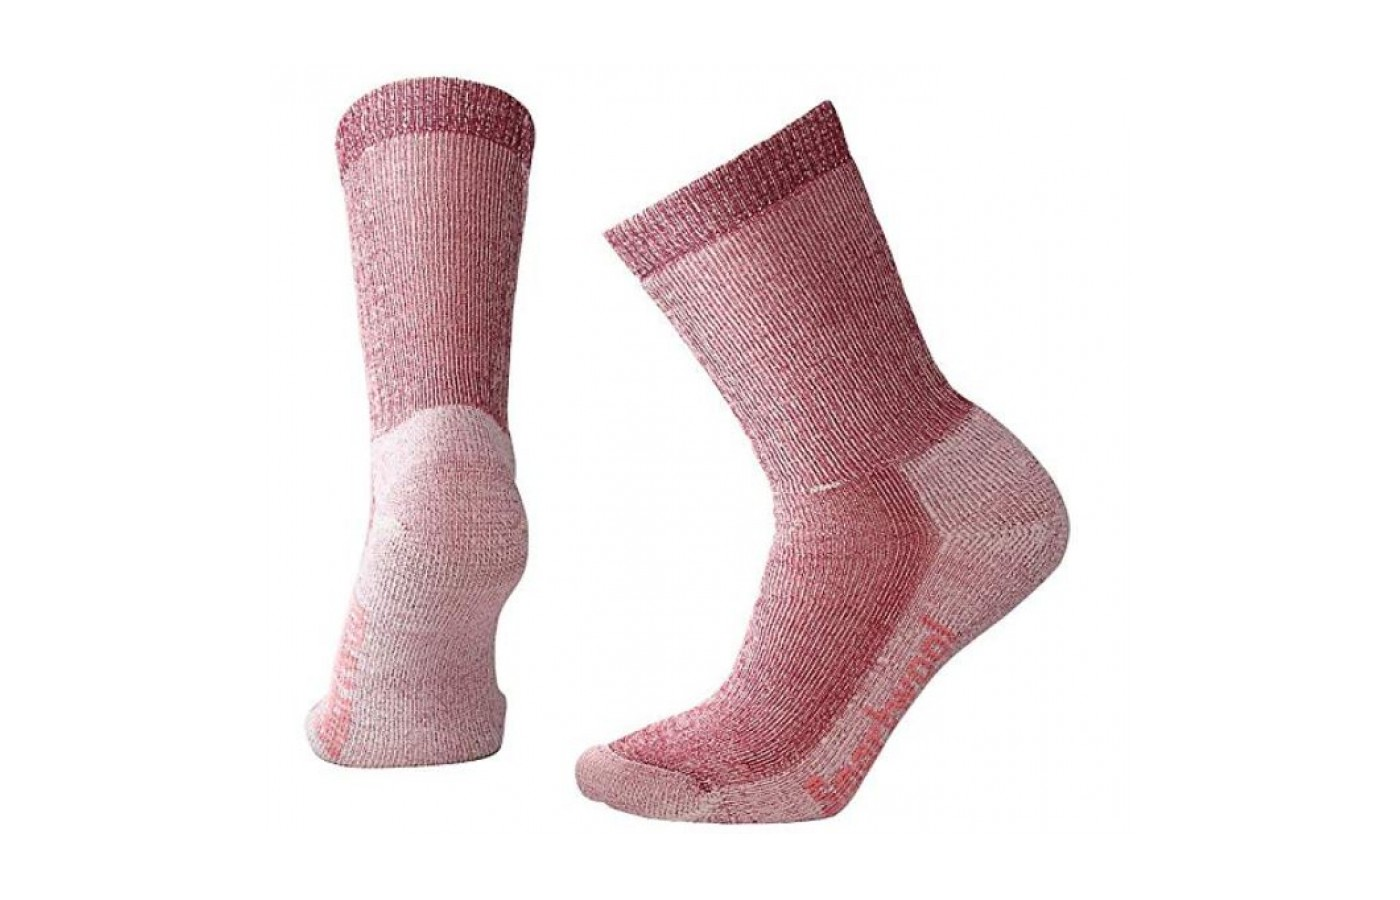 Smartwool Hike Crew Socks Red